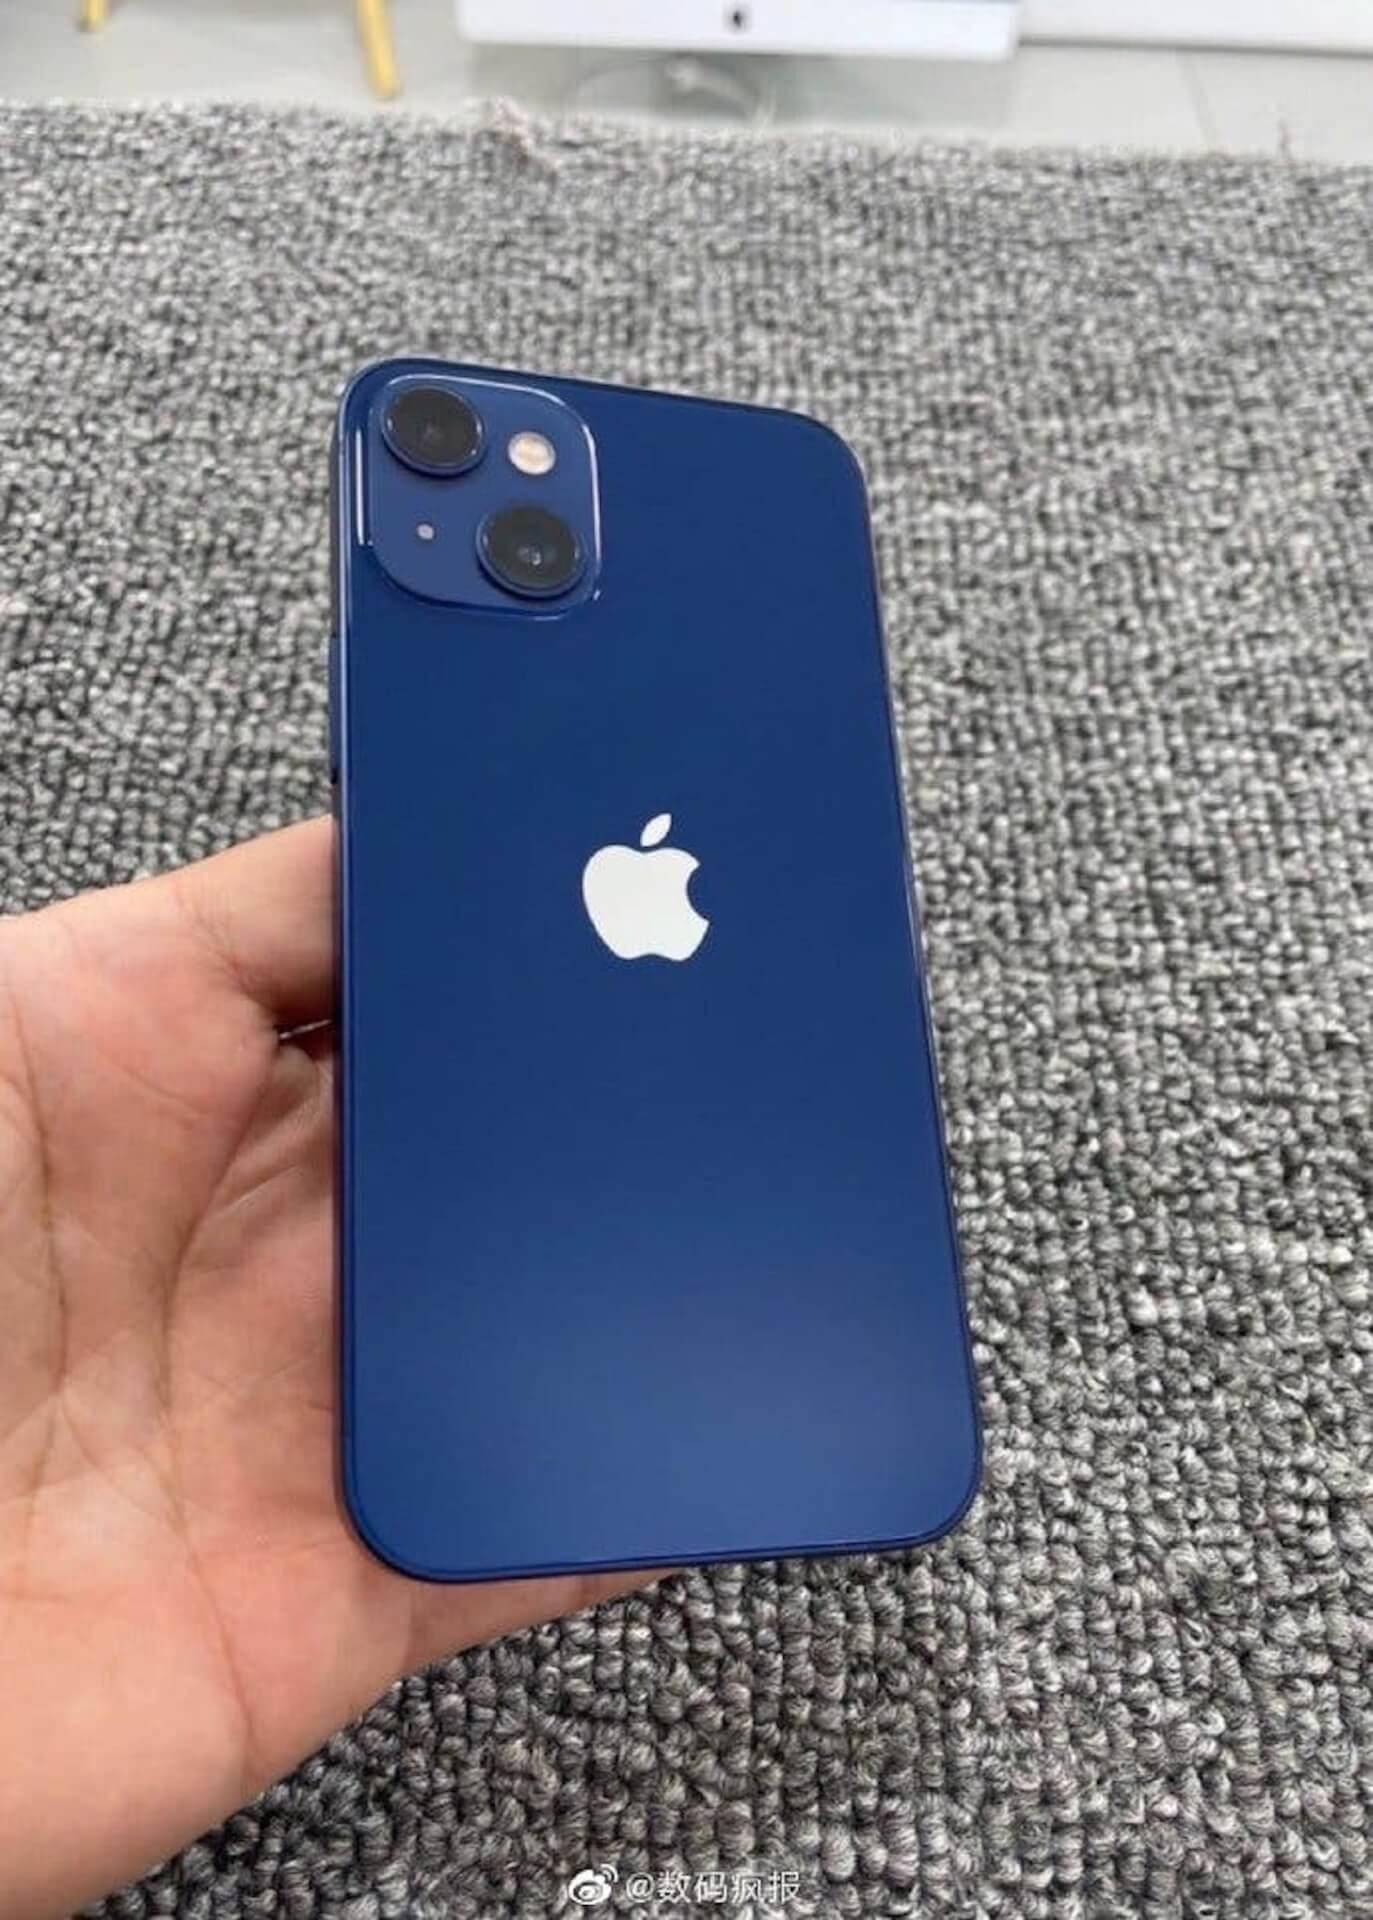 iPhone 13 miniのプロトタイプ機の画像がリーク!?リアカメラの並びが斜線状になる可能性 tech210423_iphone13mini_1